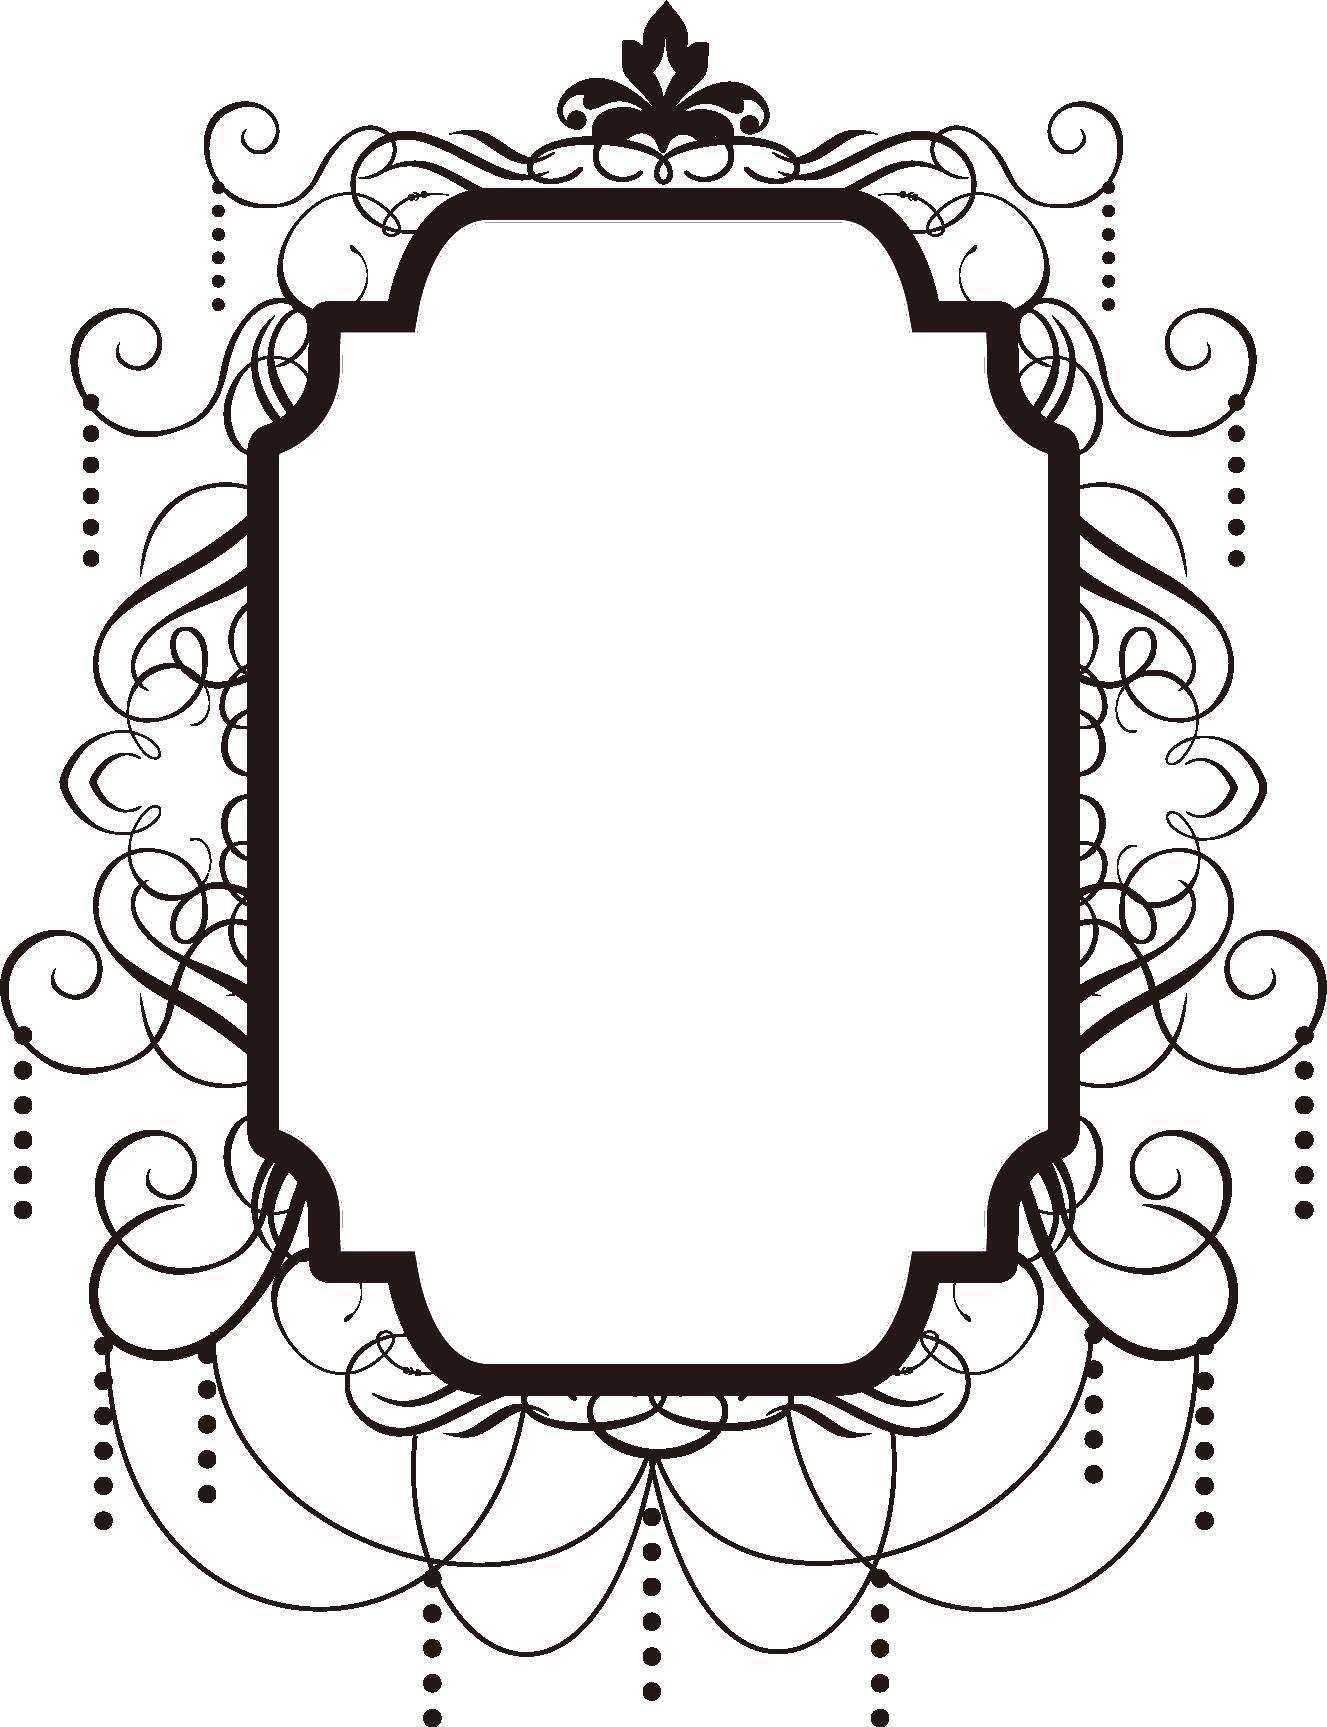 Раскраски рамка, Раскраска Рамка с узорами прямоугольная ...